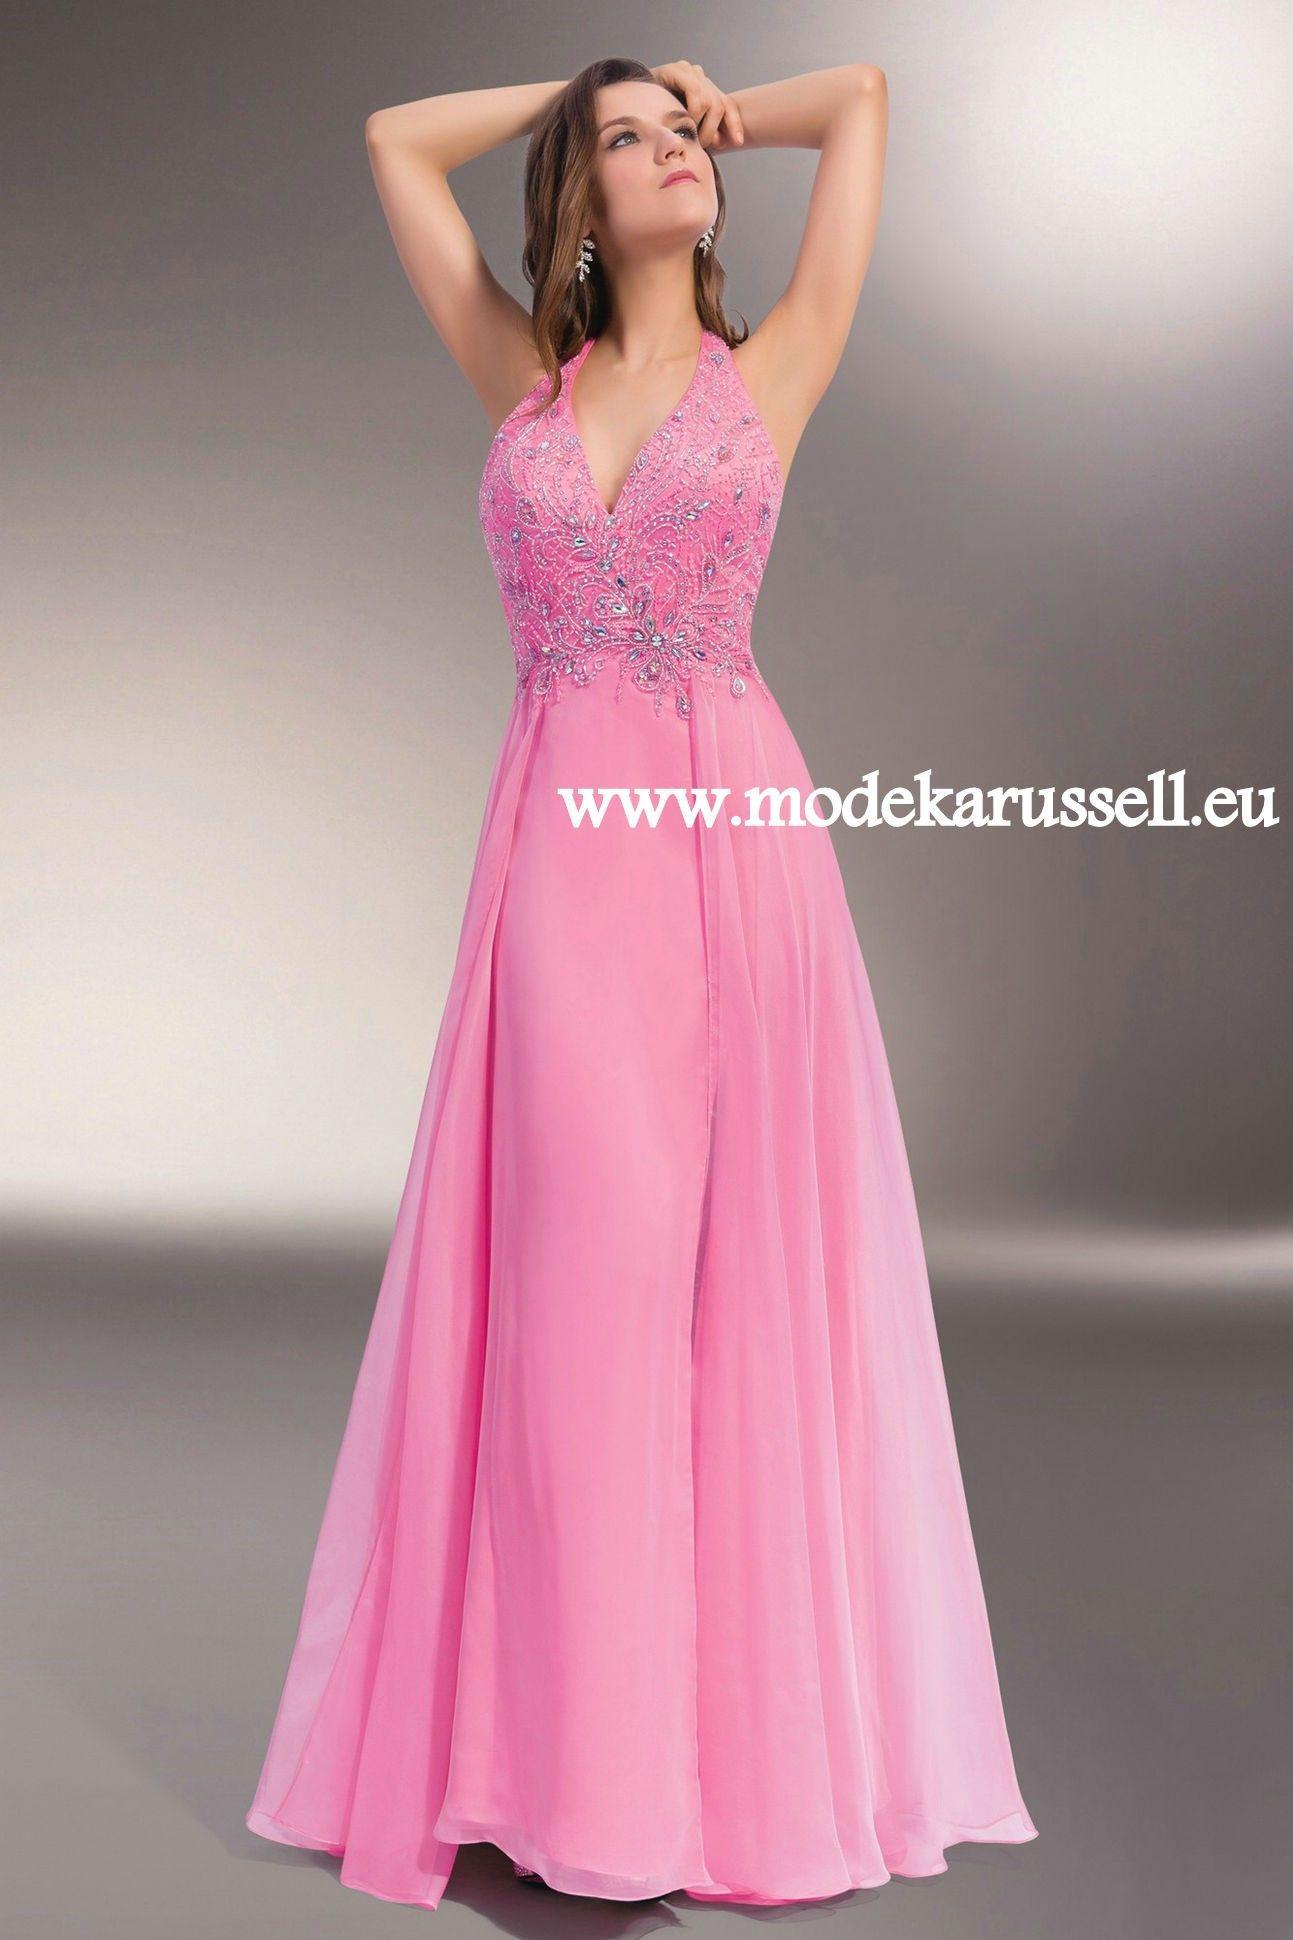 13 Perfekt Abendkleider Rosa VertriebDesigner Leicht Abendkleider Rosa Spezialgebiet